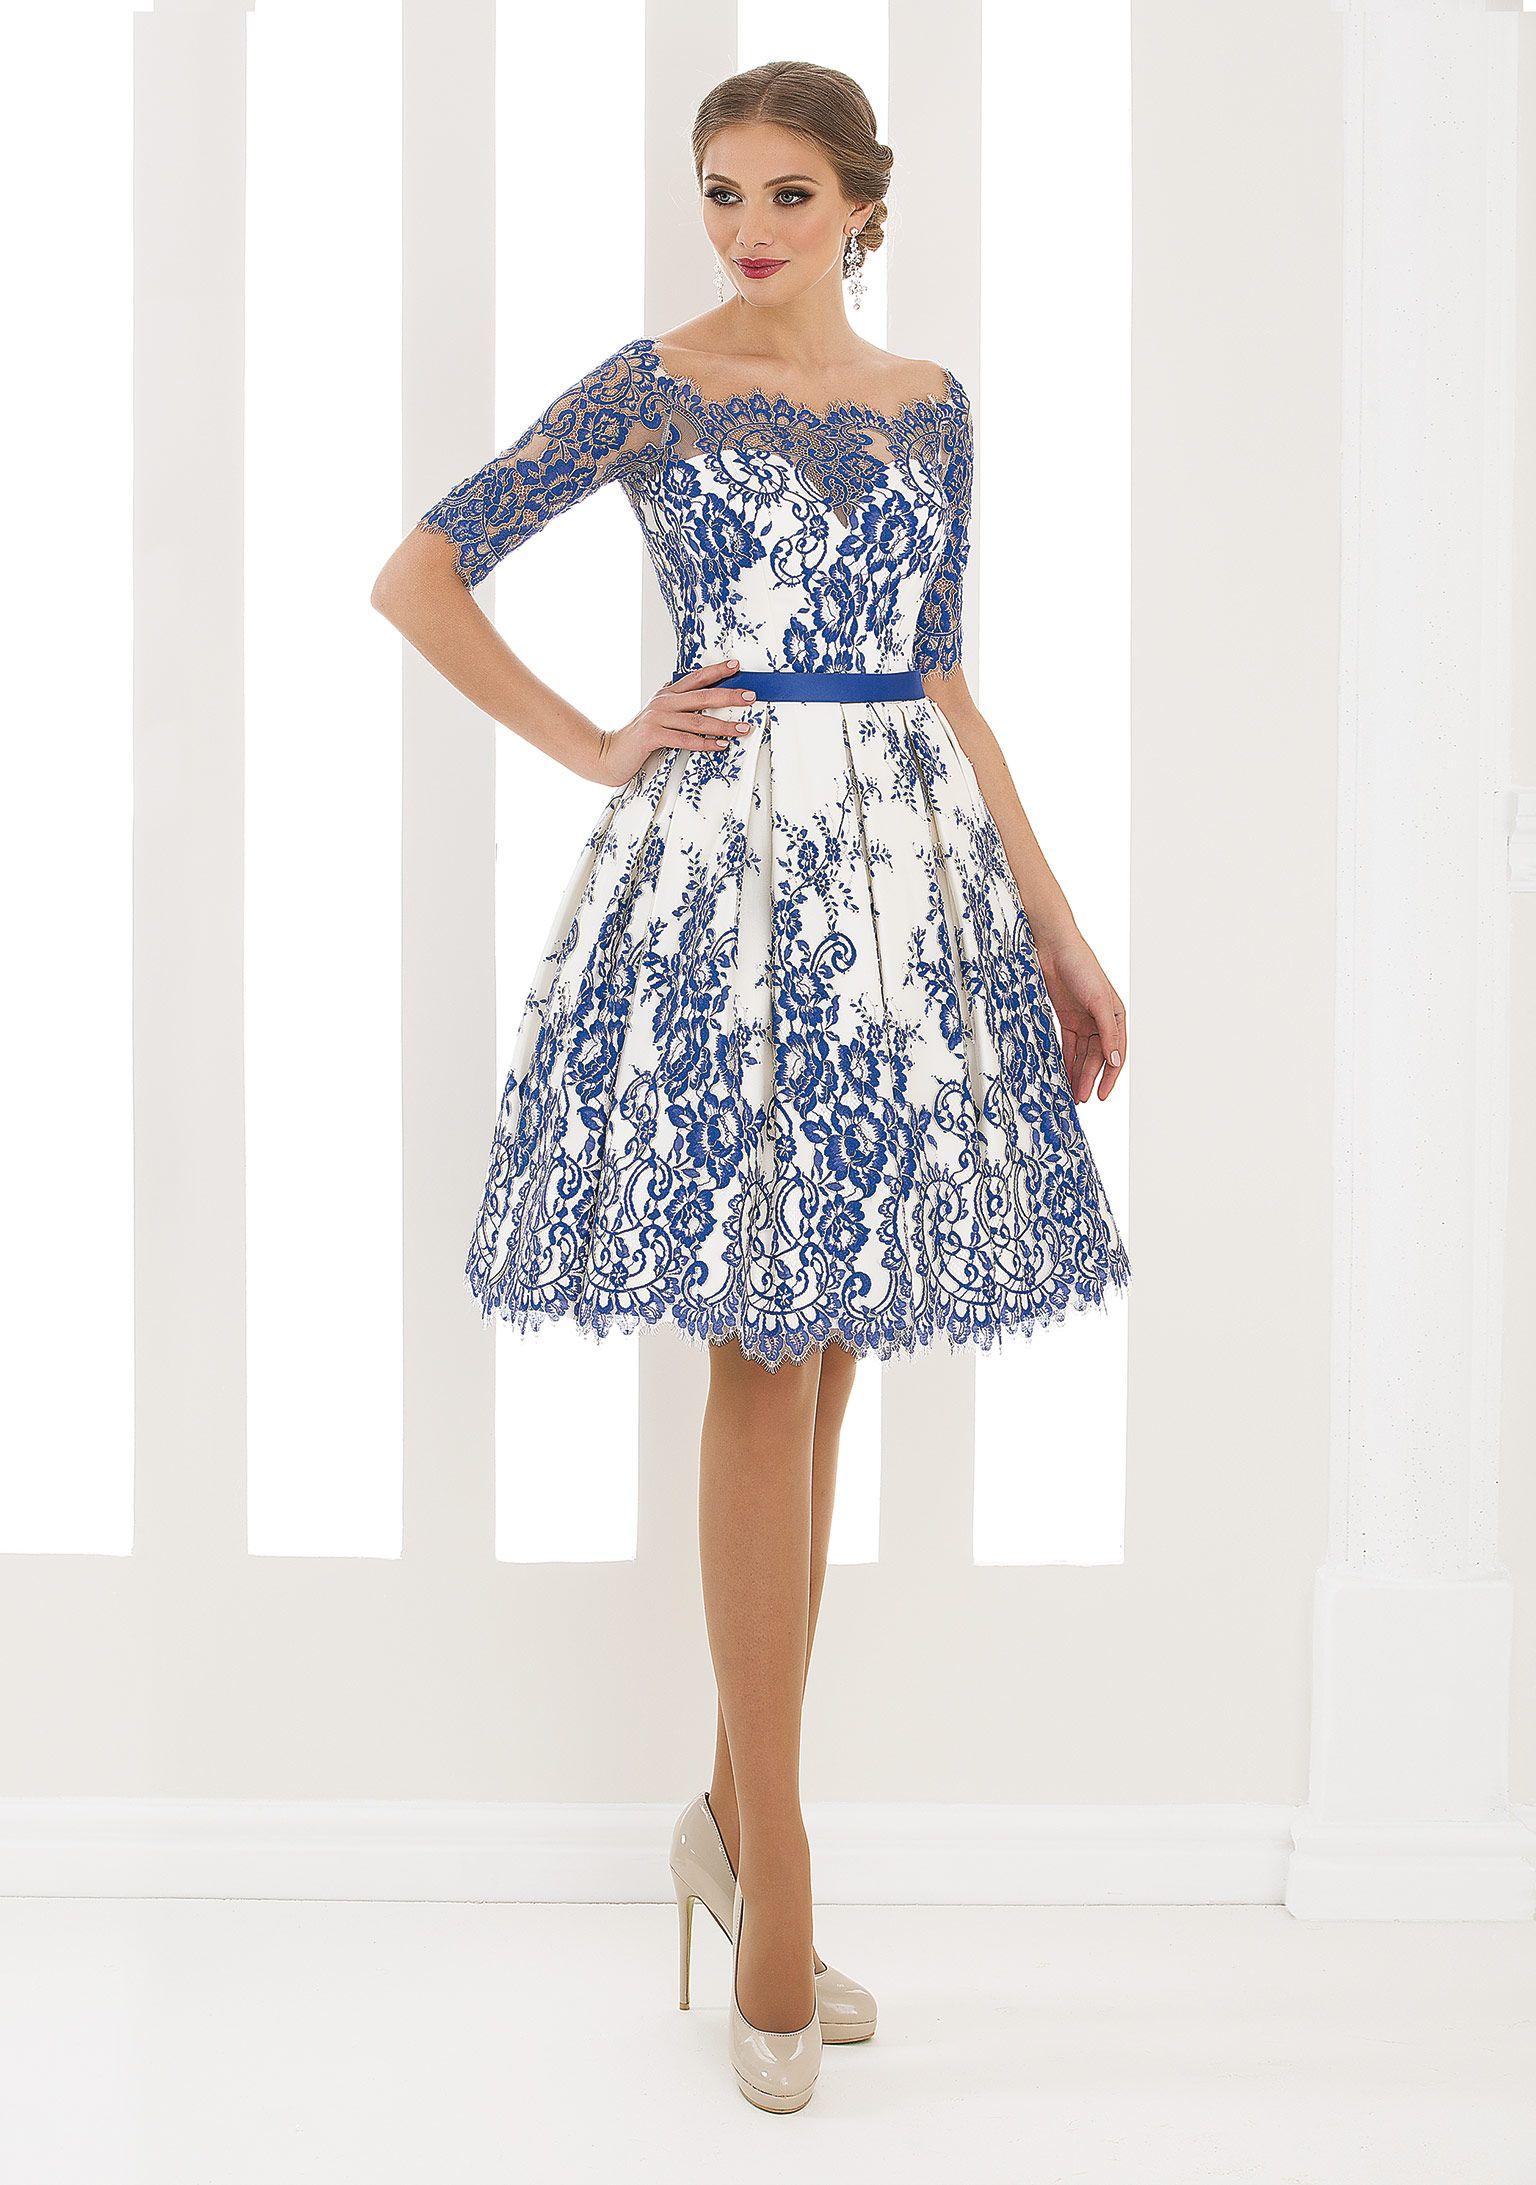 White Lady - colectia de rochii de seara 2016 | The Dress ...